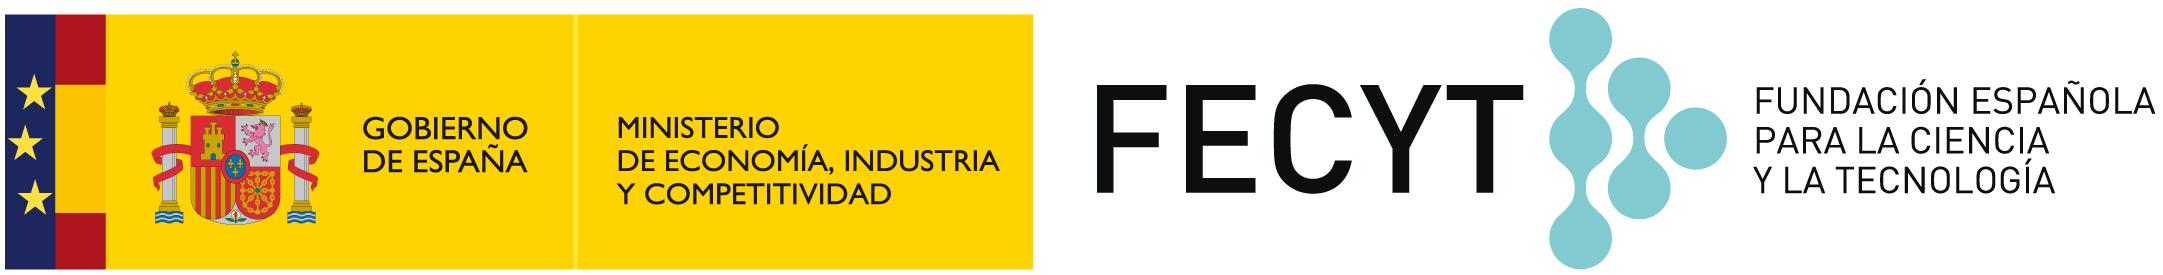 logo_MINECO_FECYT_Web